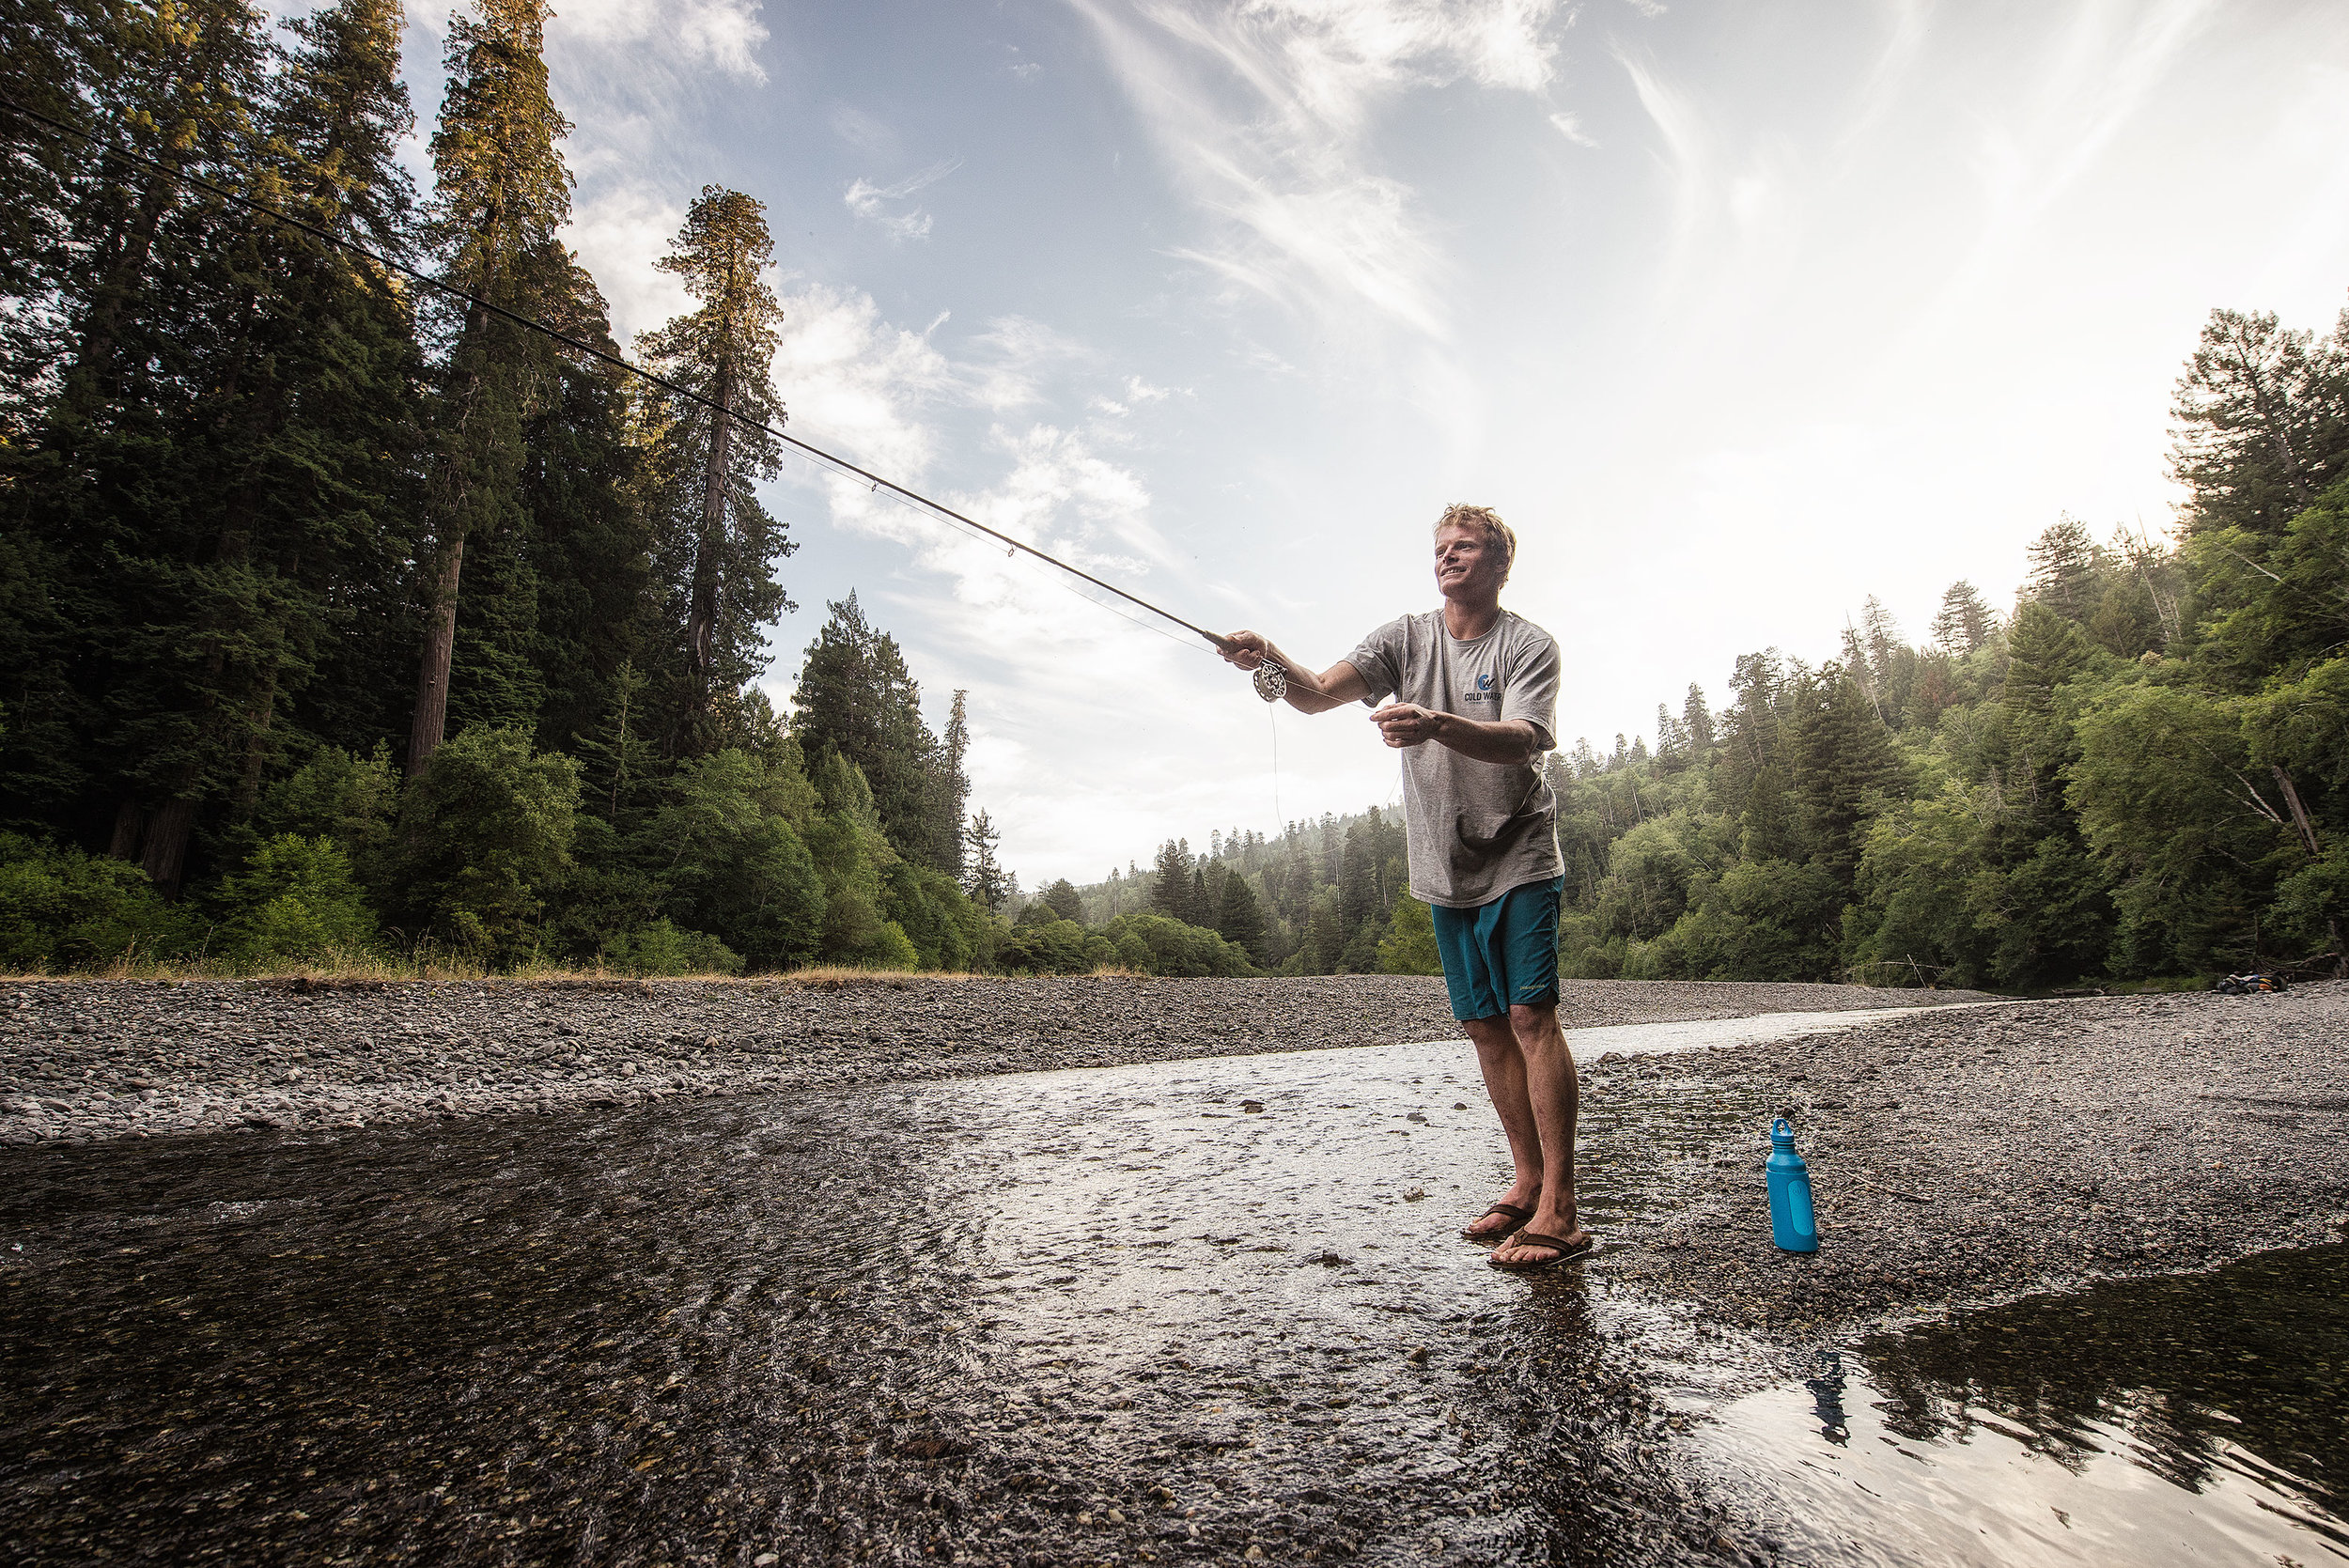 austin-trigg-redwood-water-bottle-fly-fishing-gravel-bar-river-tall-tree-grove-california-adventure.jpg